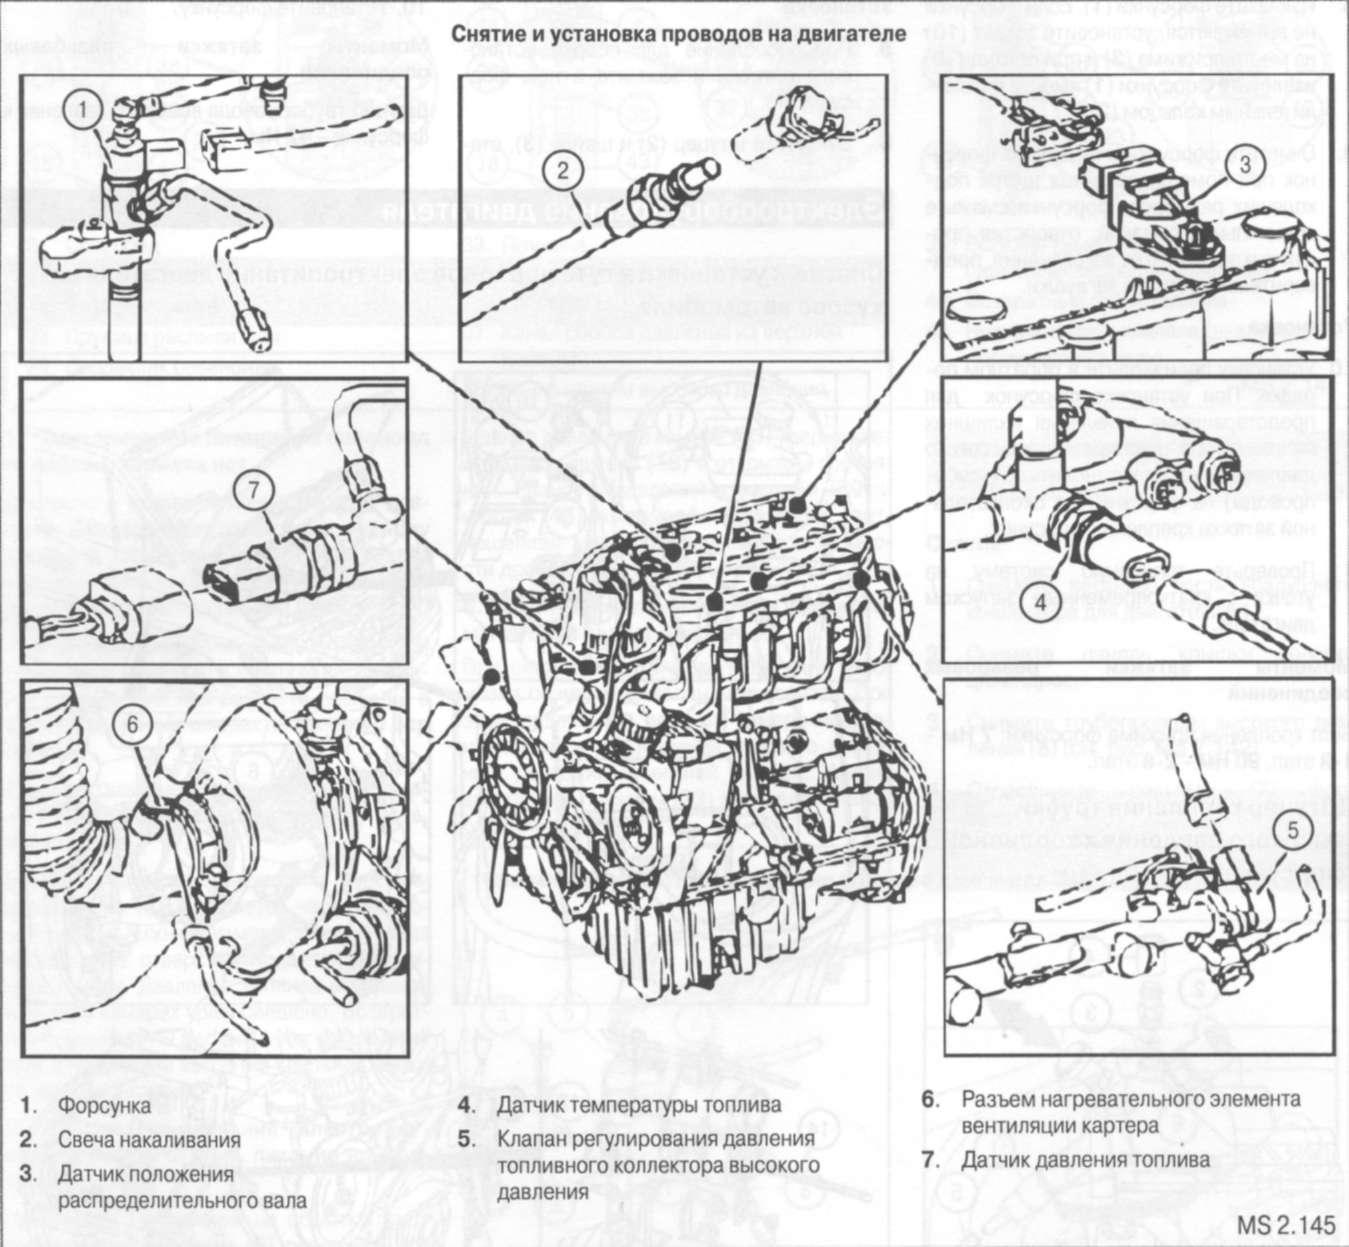 4.2.3 Снятие и установка проводов на двигателе